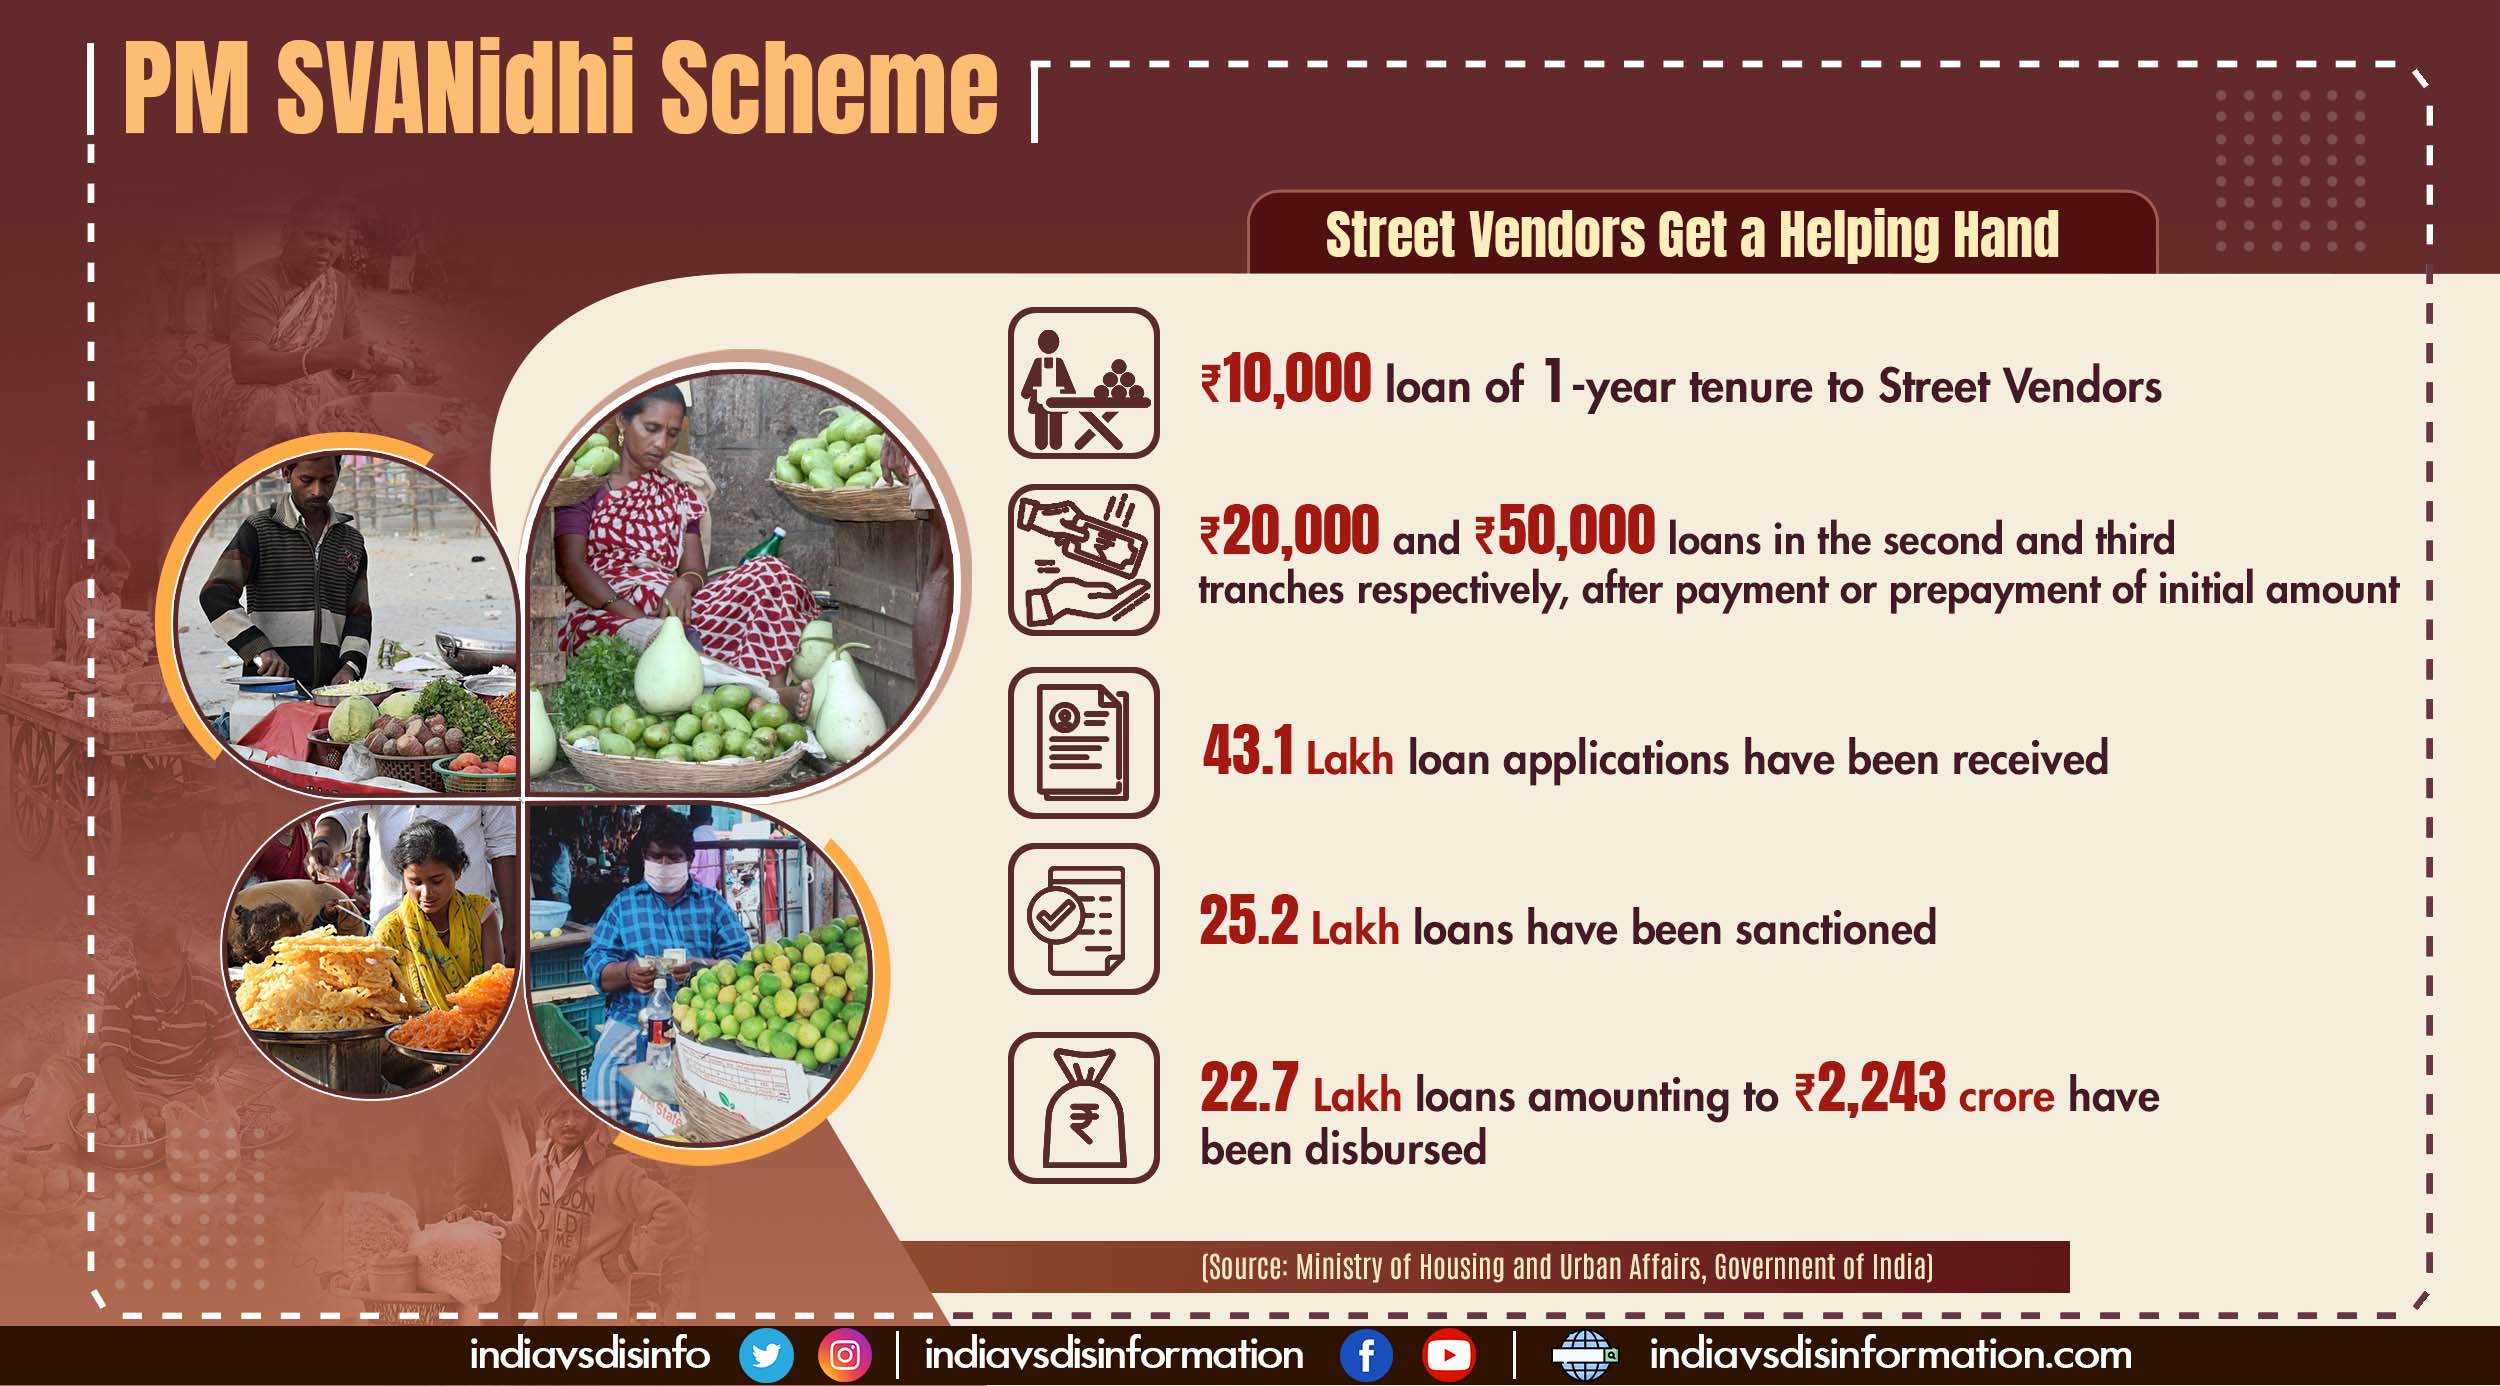 PM SVANidhi Scheme: Helping street vendors get back on their feet